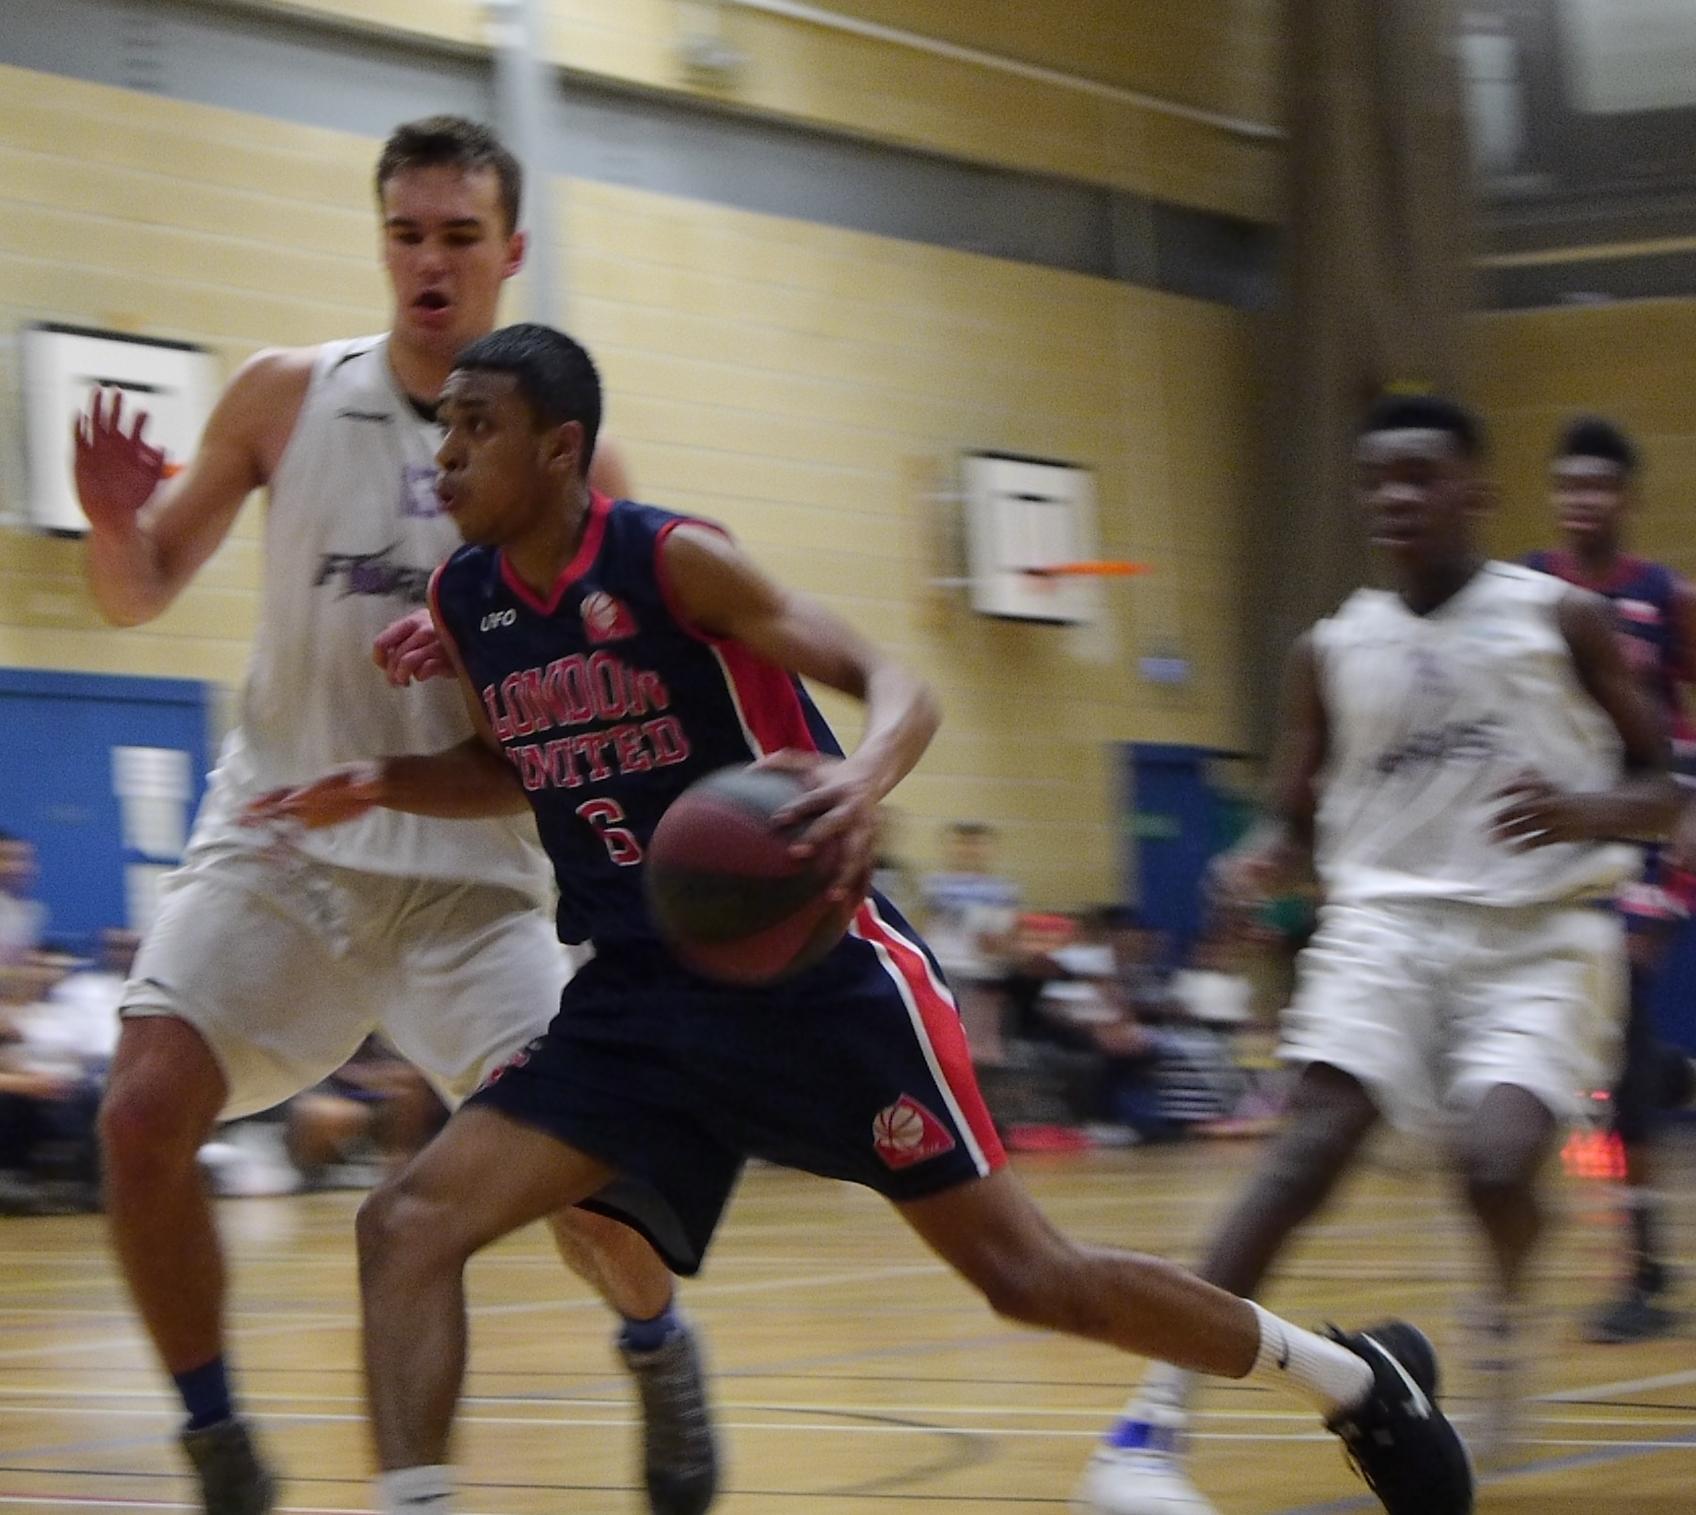 London United Basketball Elias Poorman